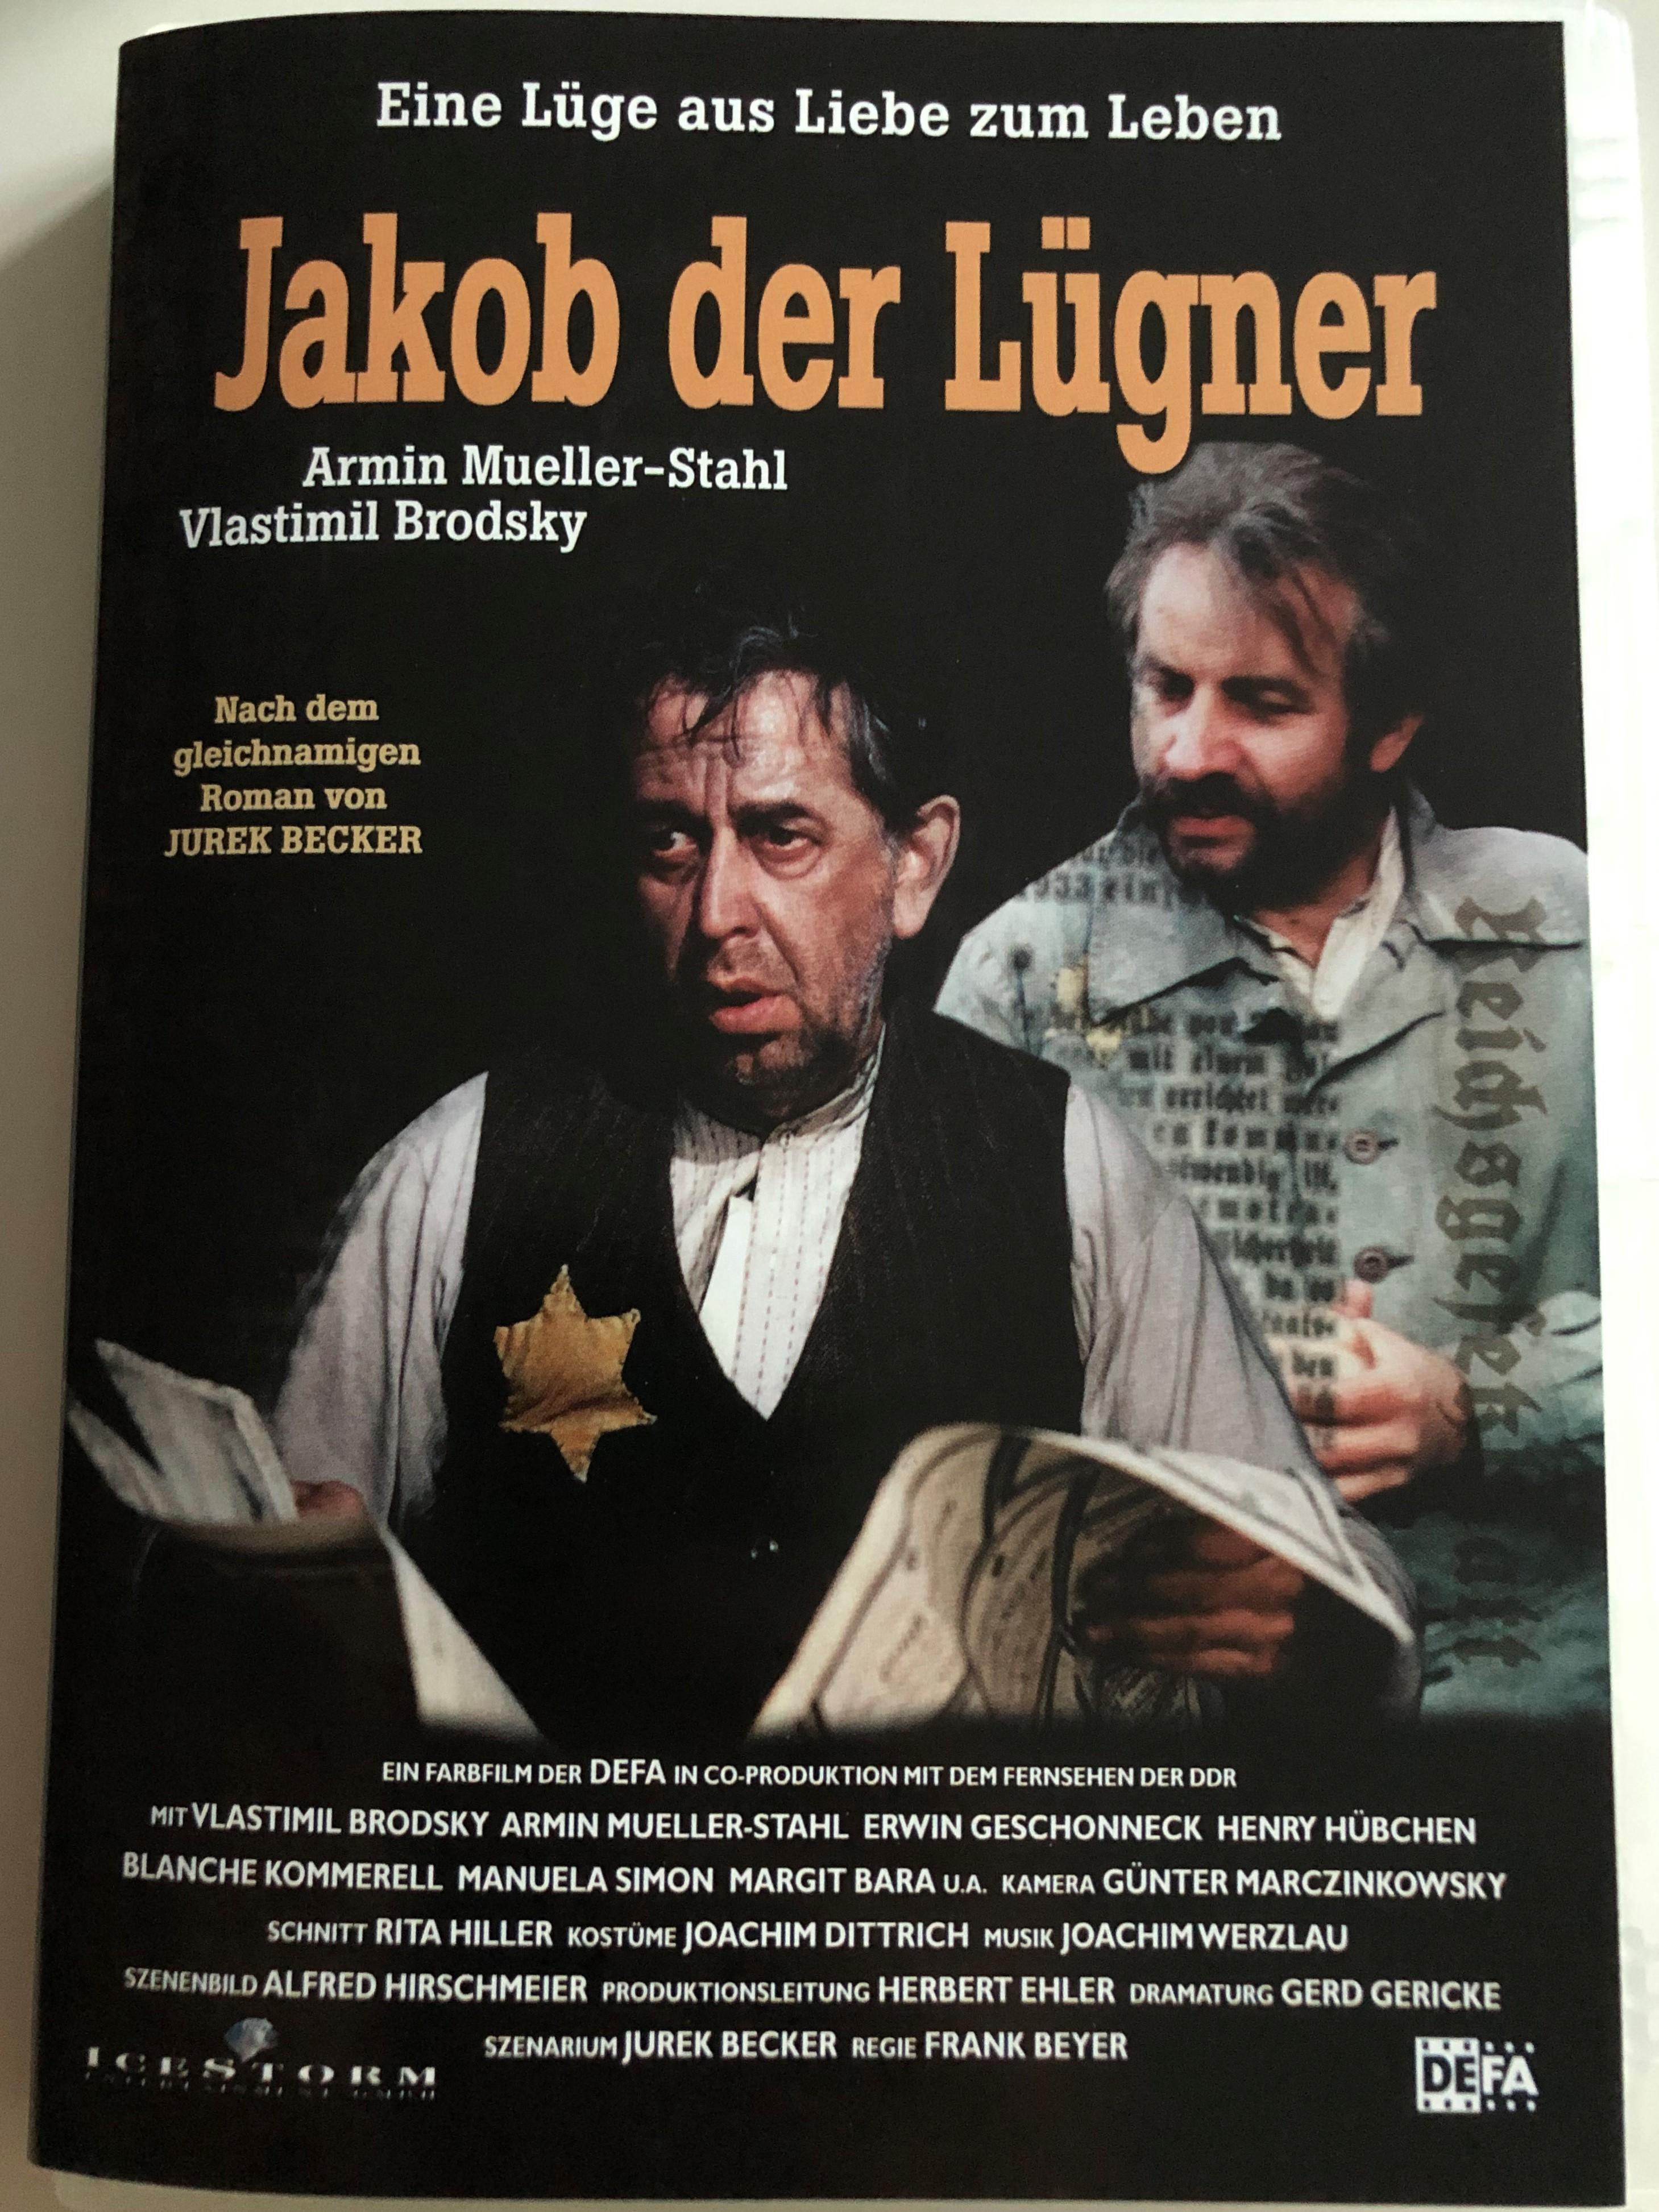 jakob-der-l-gner-dvd-1975-jacob-the-liar-directed-by-frank-beyer-starring-vlastimil-brodsk-armin-mueller-stahl-nach-dem-gleichnamigen-roman-von-jurek-becker-1-.jpg